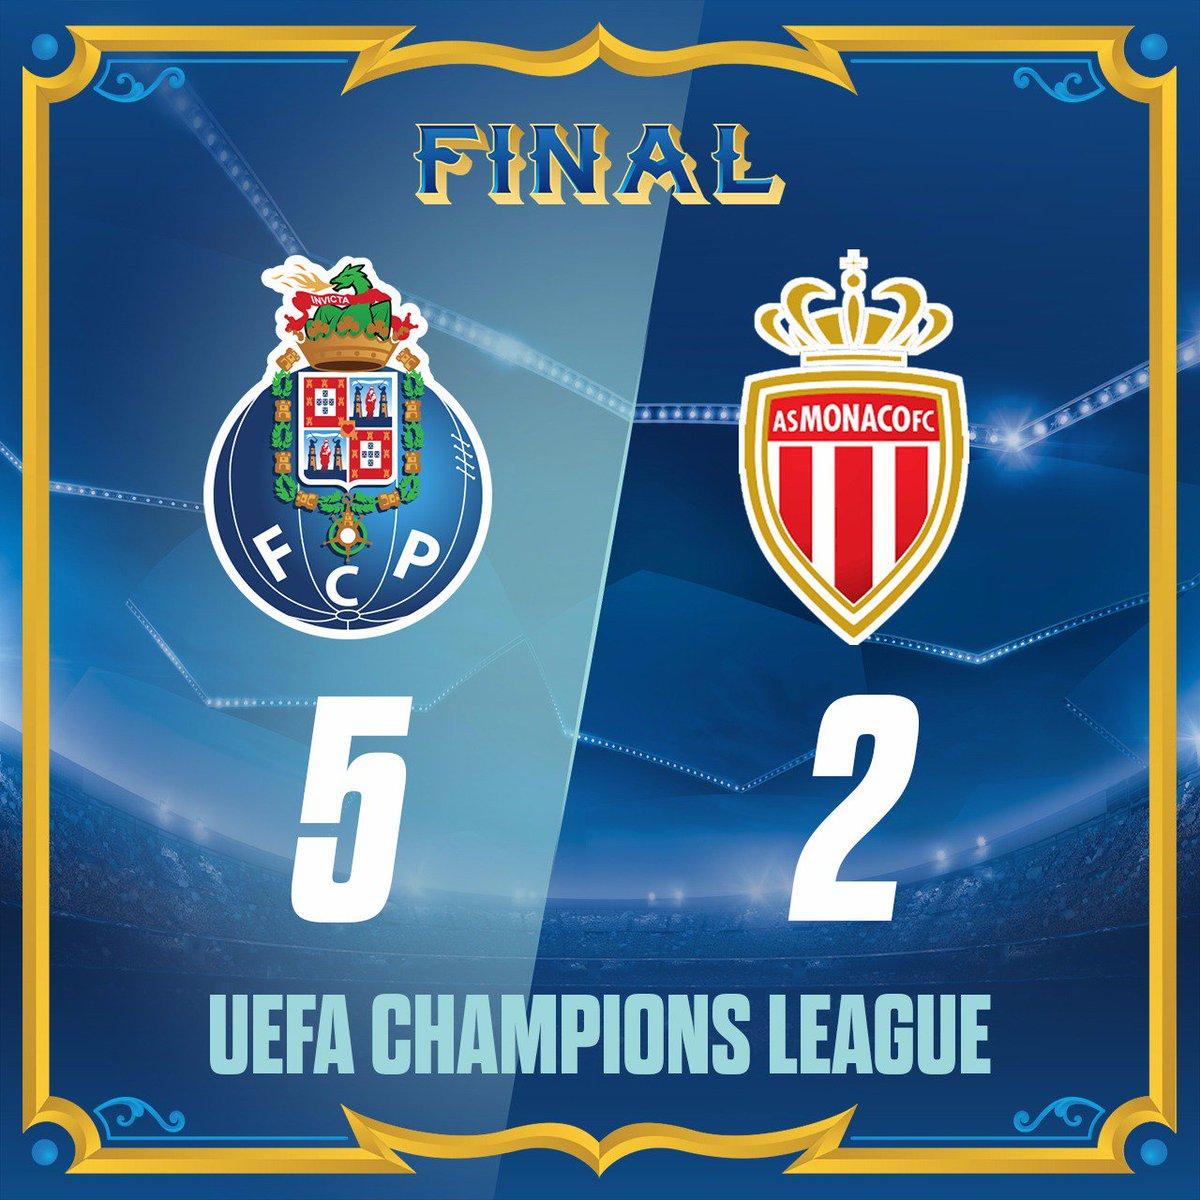 Final de Jogo / End of the match / Final del Partido  9' [1-0] Aboubakar ⚽ 33' [2-0] Aboubakar ⚽ 45' [3-0] Brahimi ⚽ 61' [3-1] Glik ⚽ 65' [4-1] Alex Telles ⚽ 78' [4-2] Falcao ⚽ 88' [5-2] Soares ⚽  #FCPorto #FCPASM #UCL